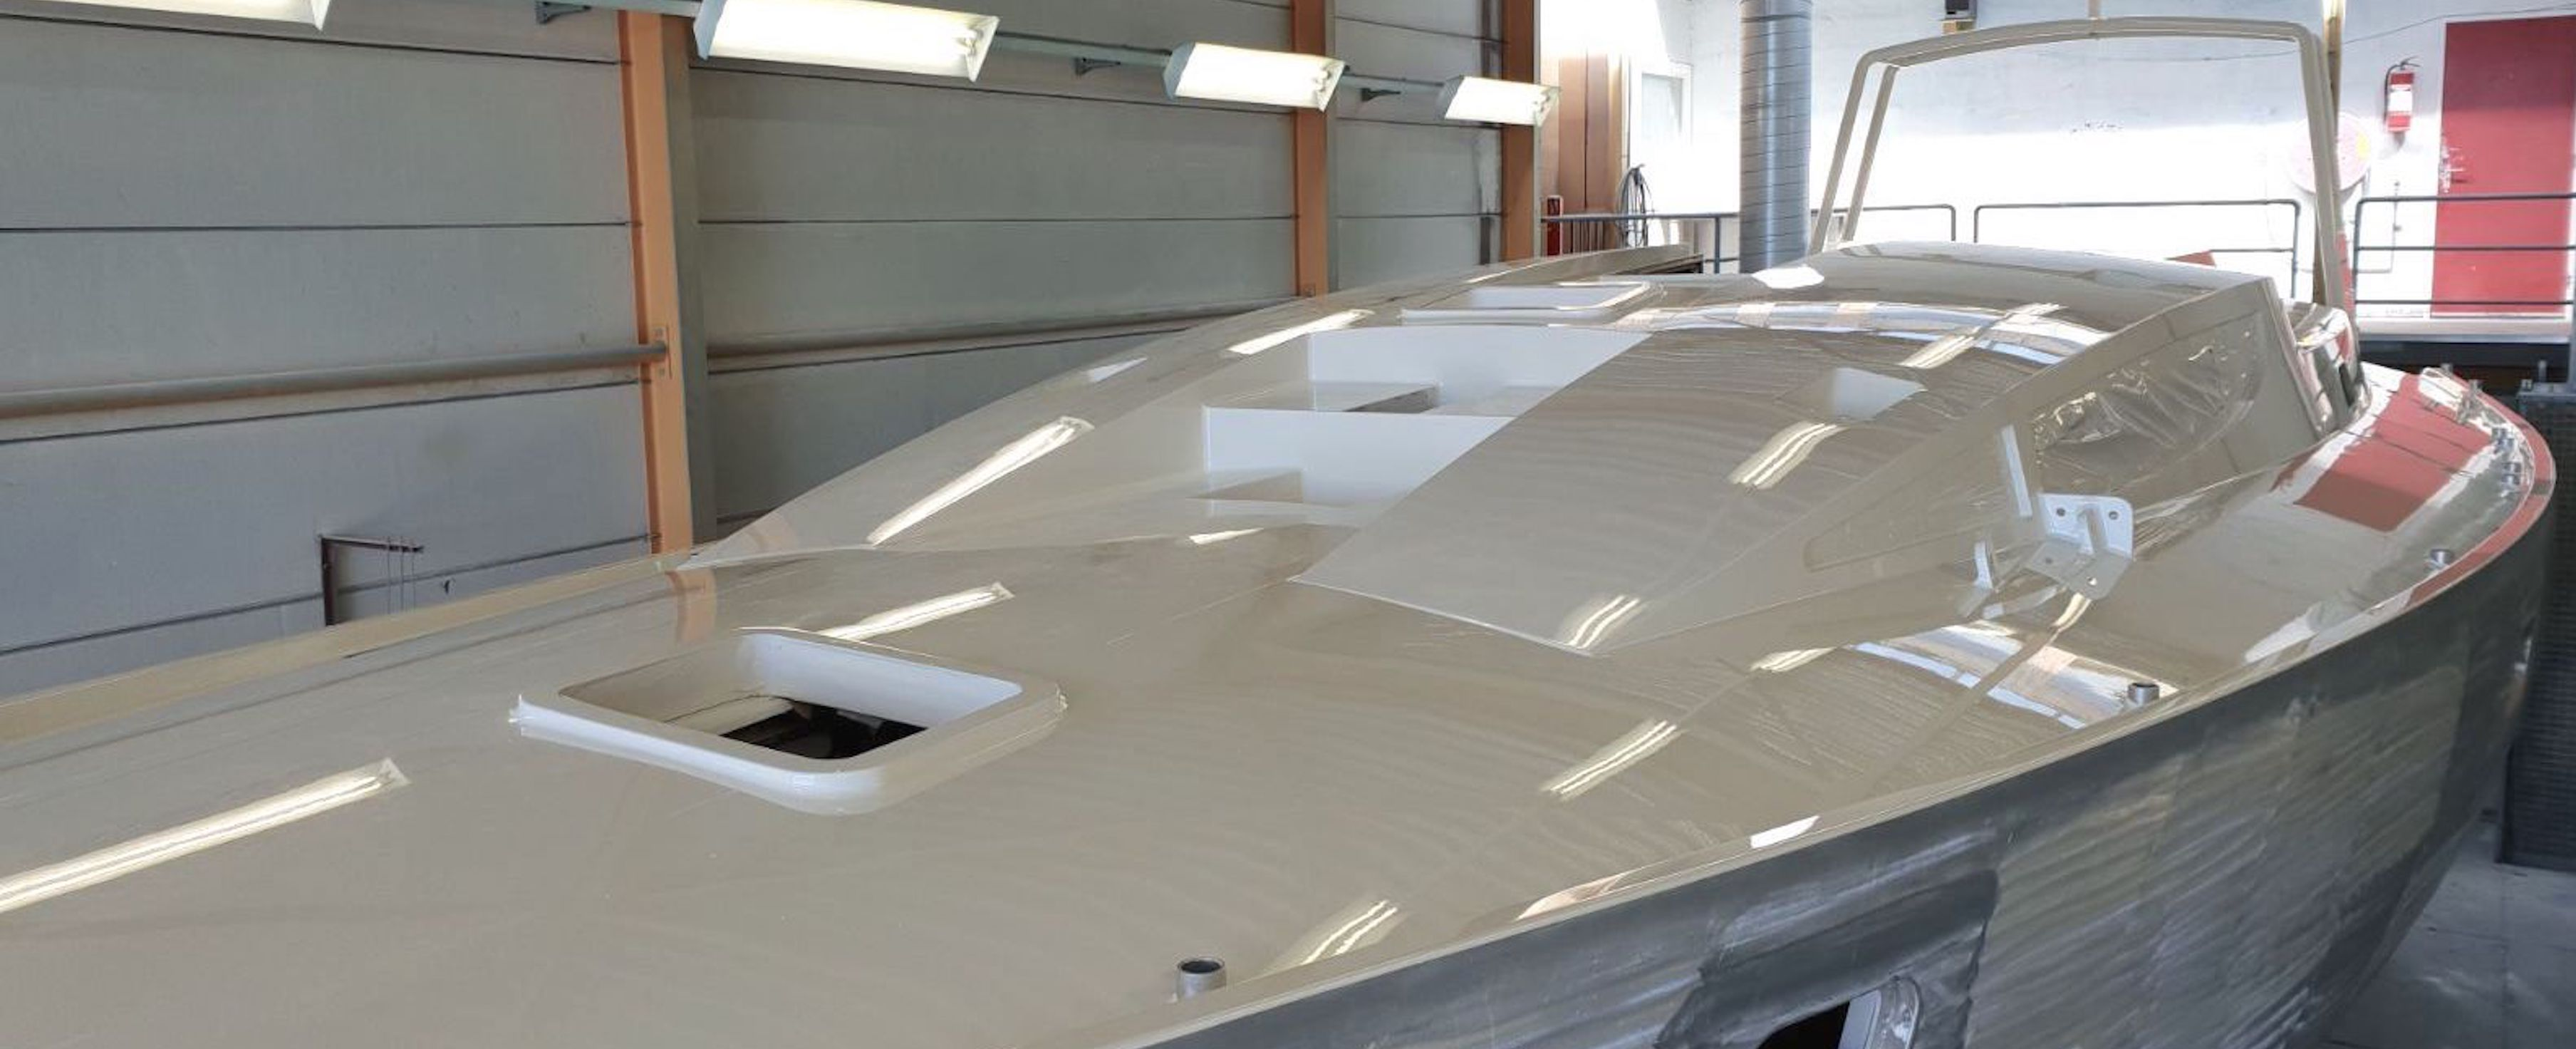 aluminium 47 explorer yacht tipsy tuna Hutting Yachts